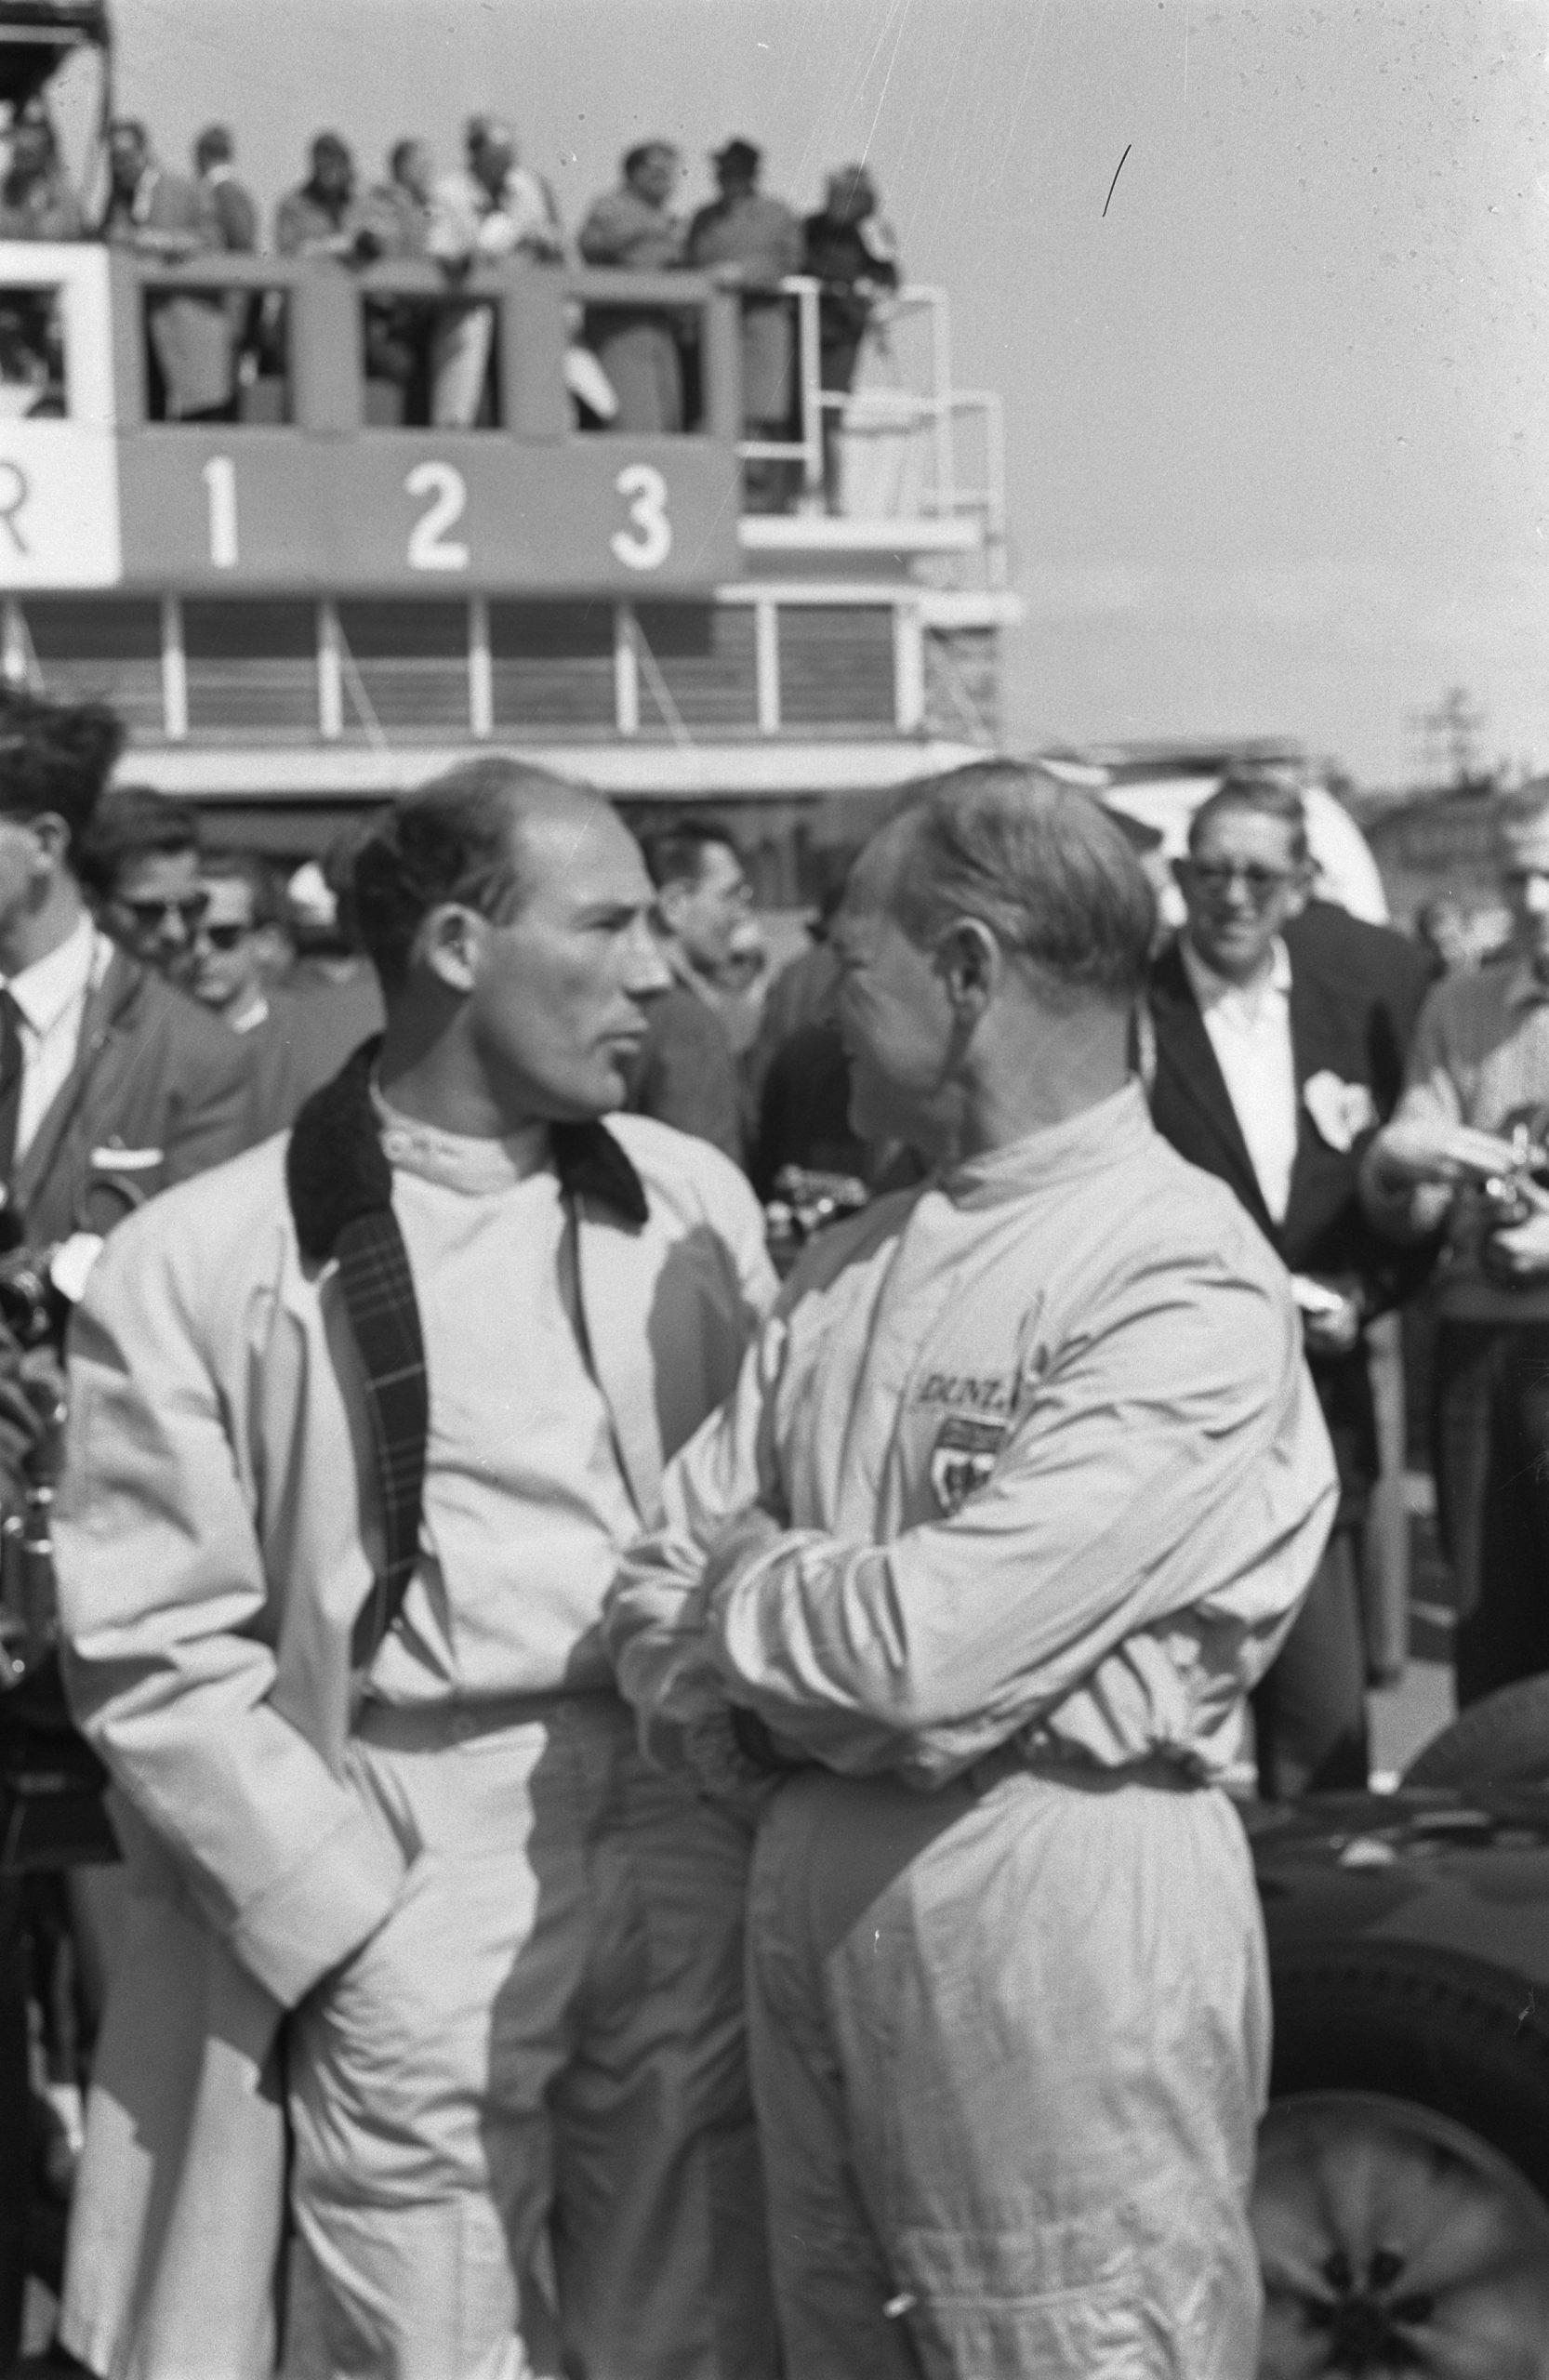 Stirling Moss 1961 grand prix innes ireland